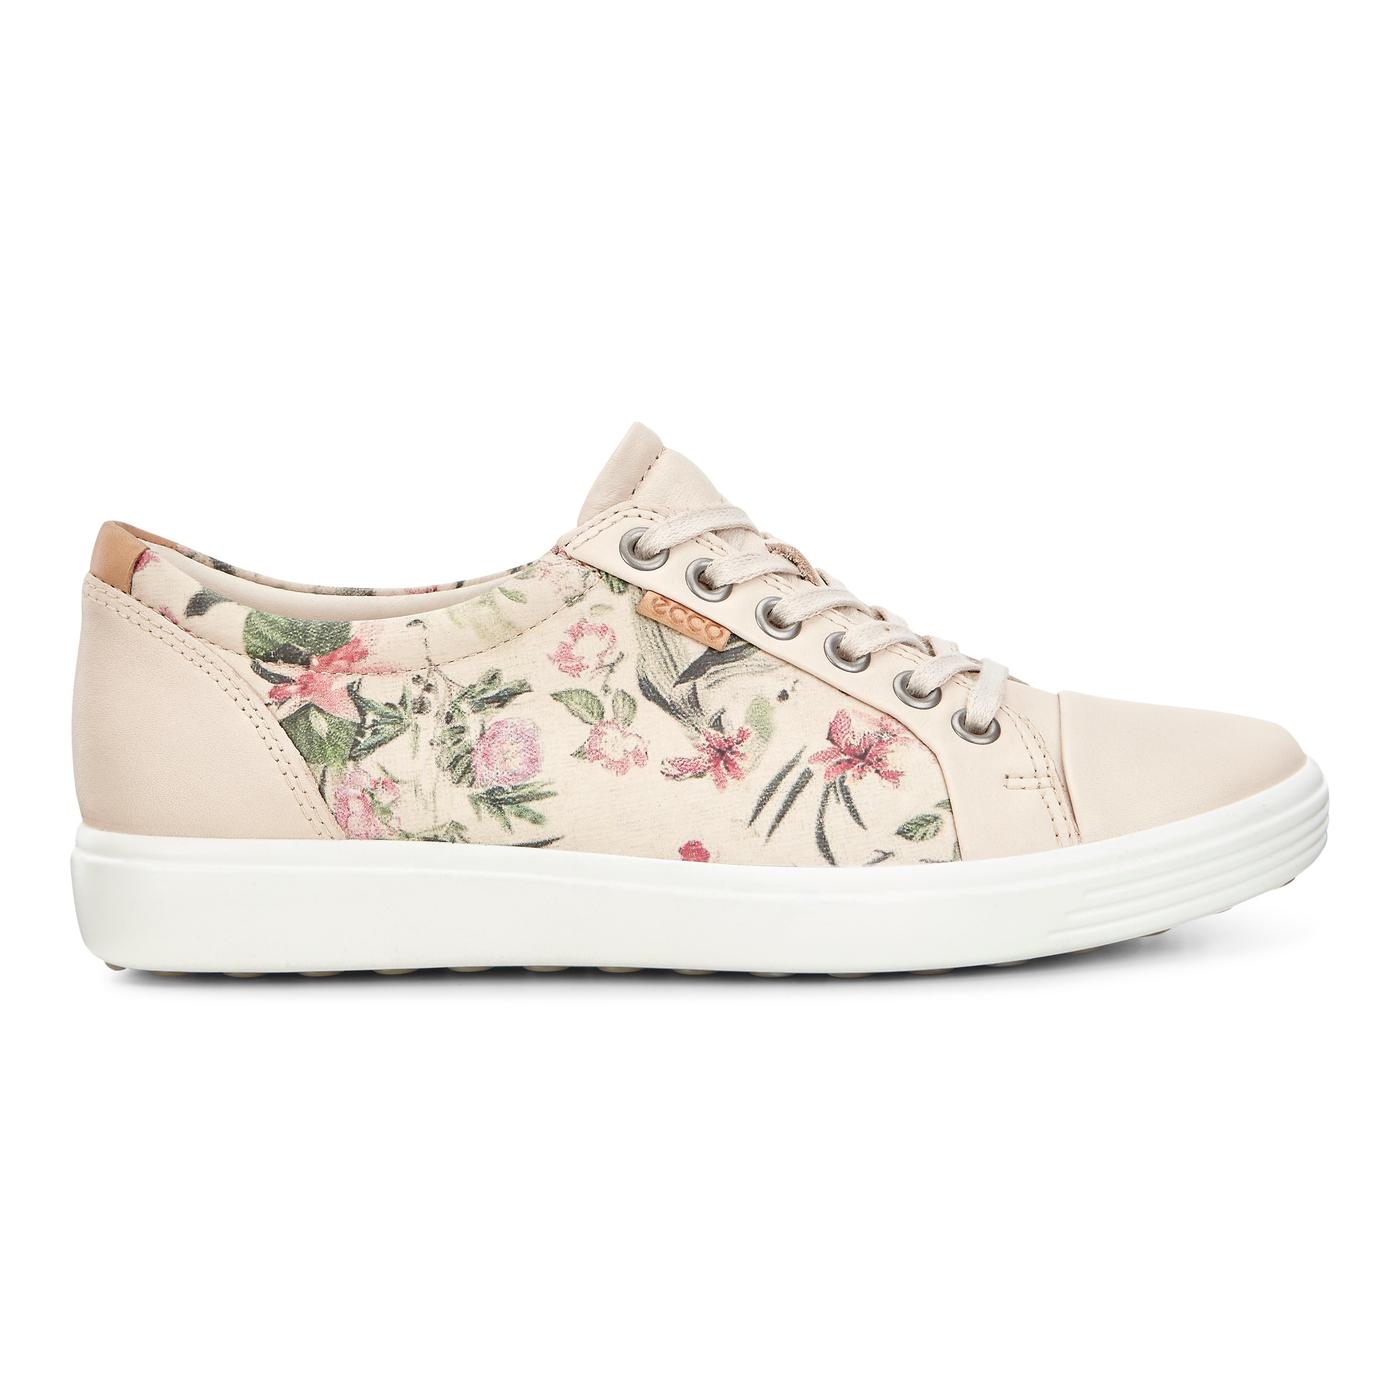 ECCO SOFT 7 W Shoe